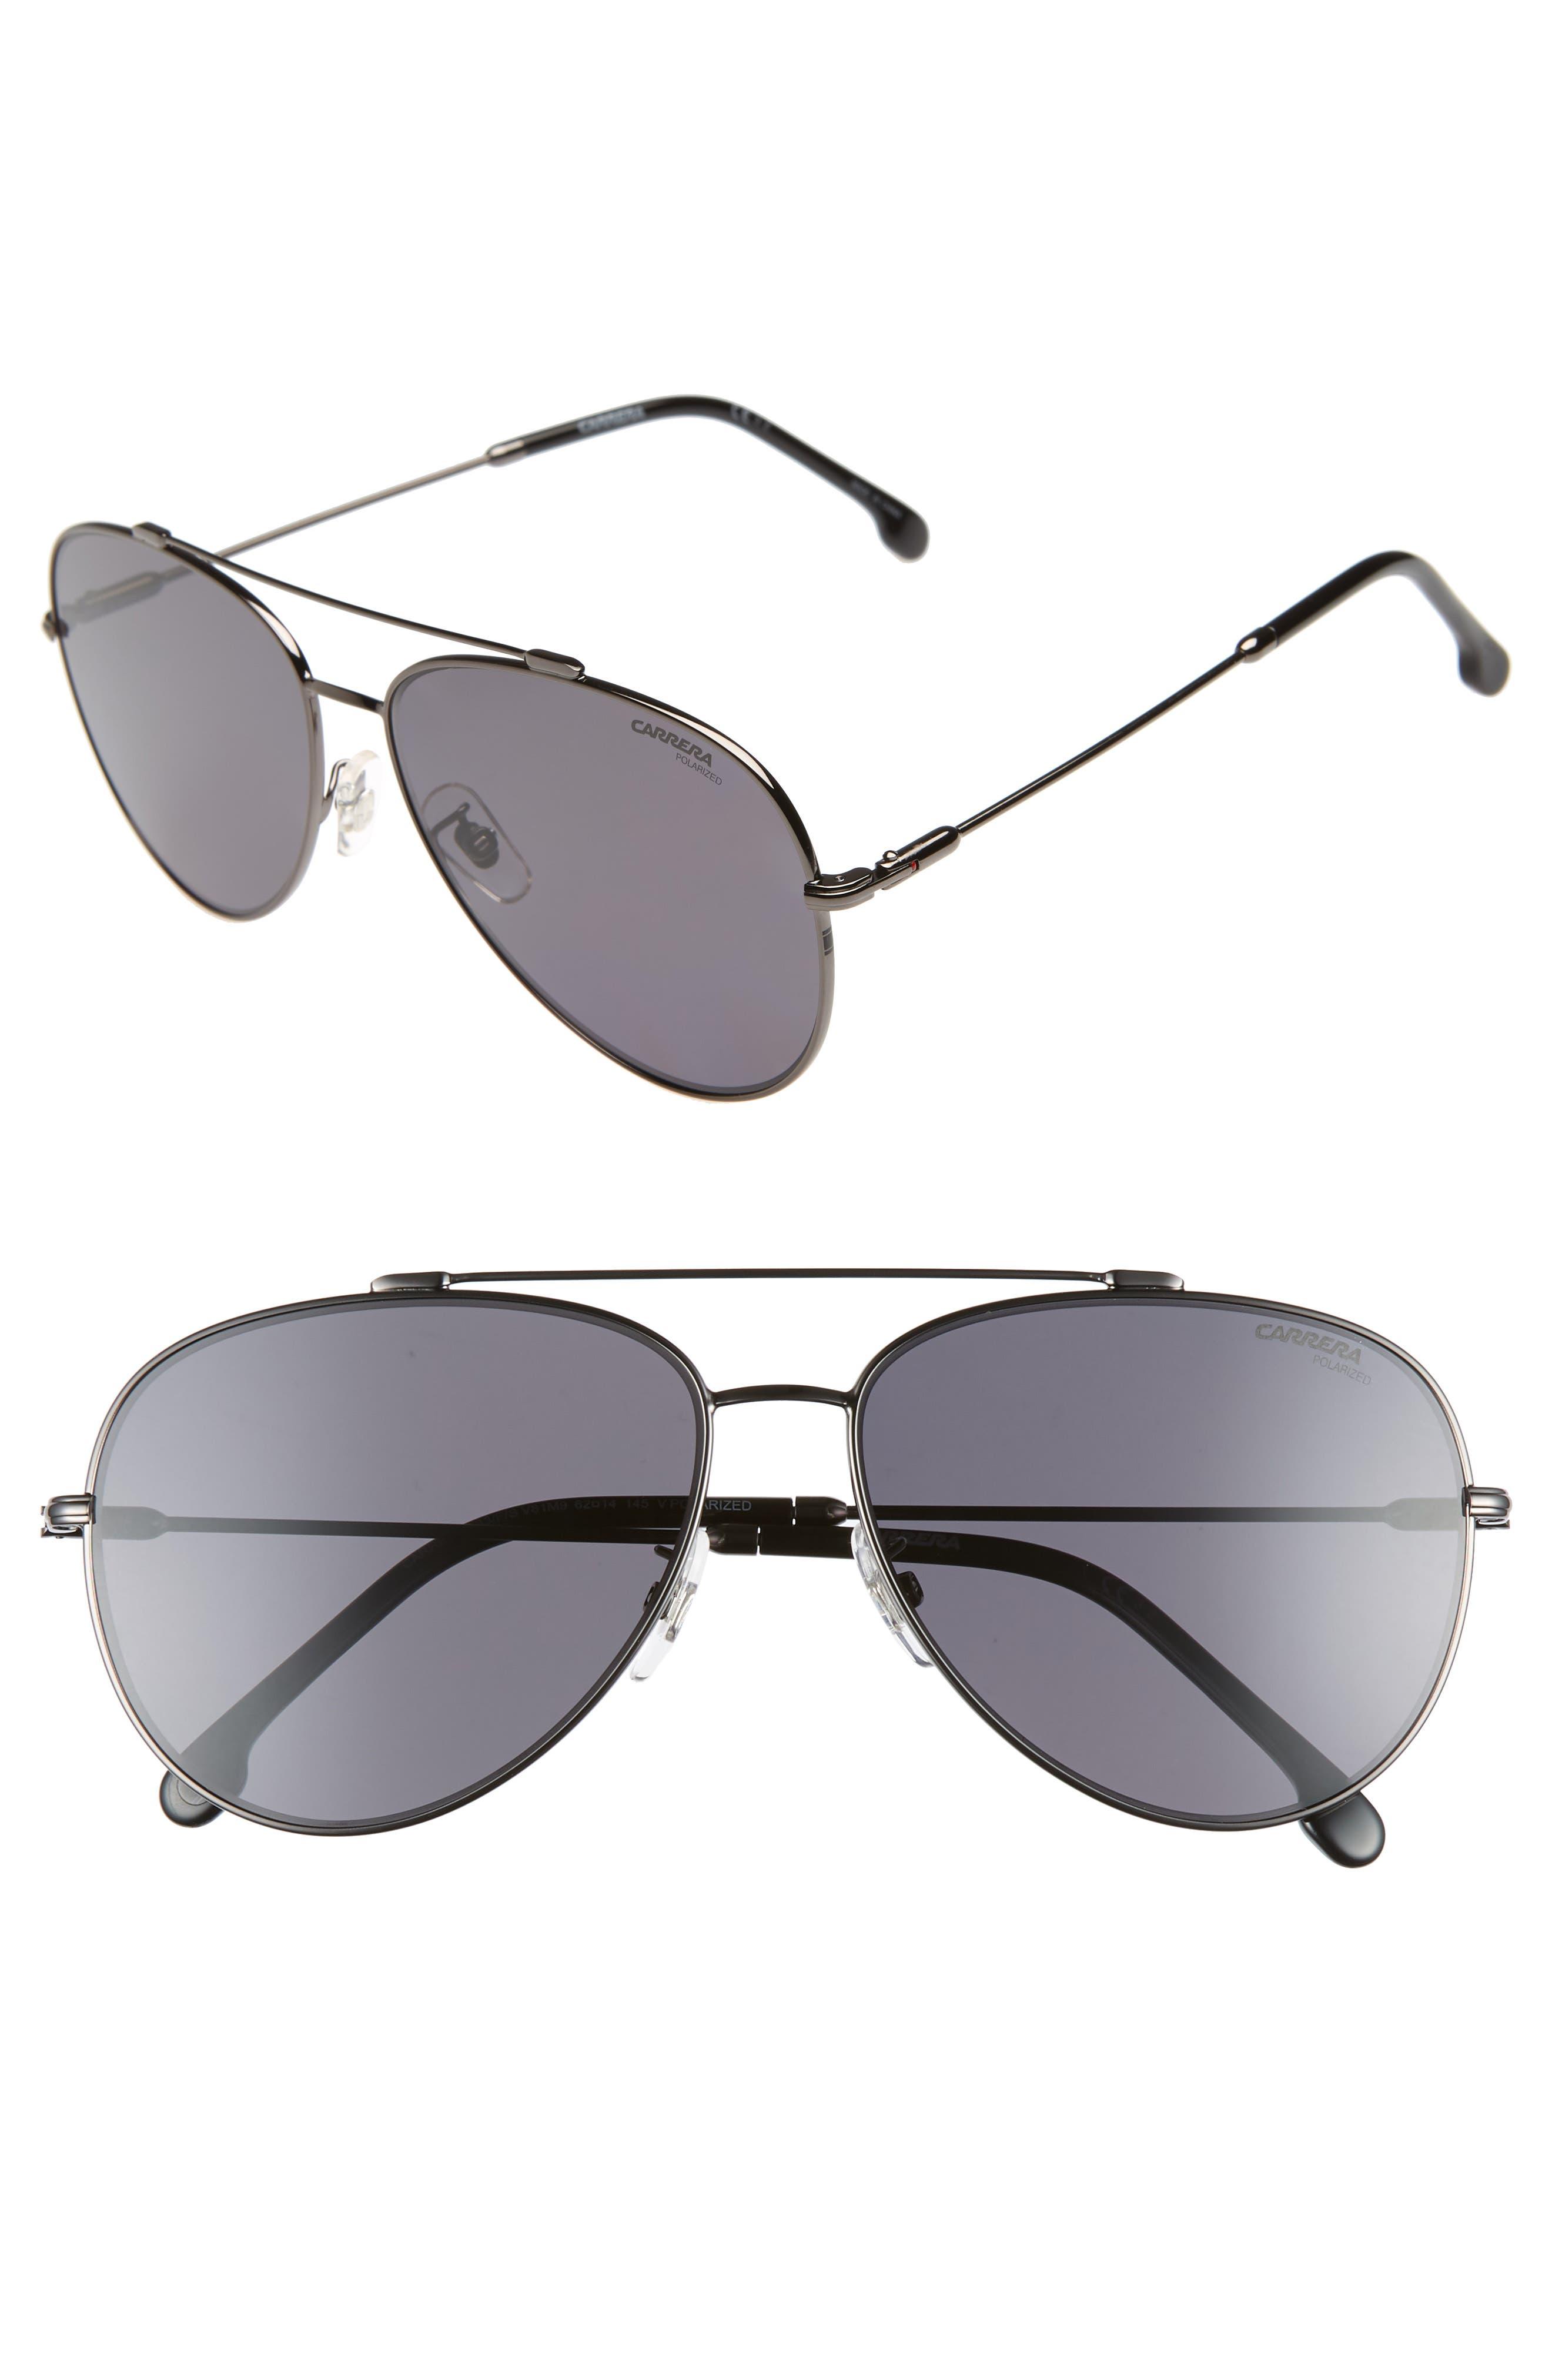 62mm Polarized Aviator Sunglasses,                             Main thumbnail 1, color,                             DARK RUTHENIUM/ BLACK